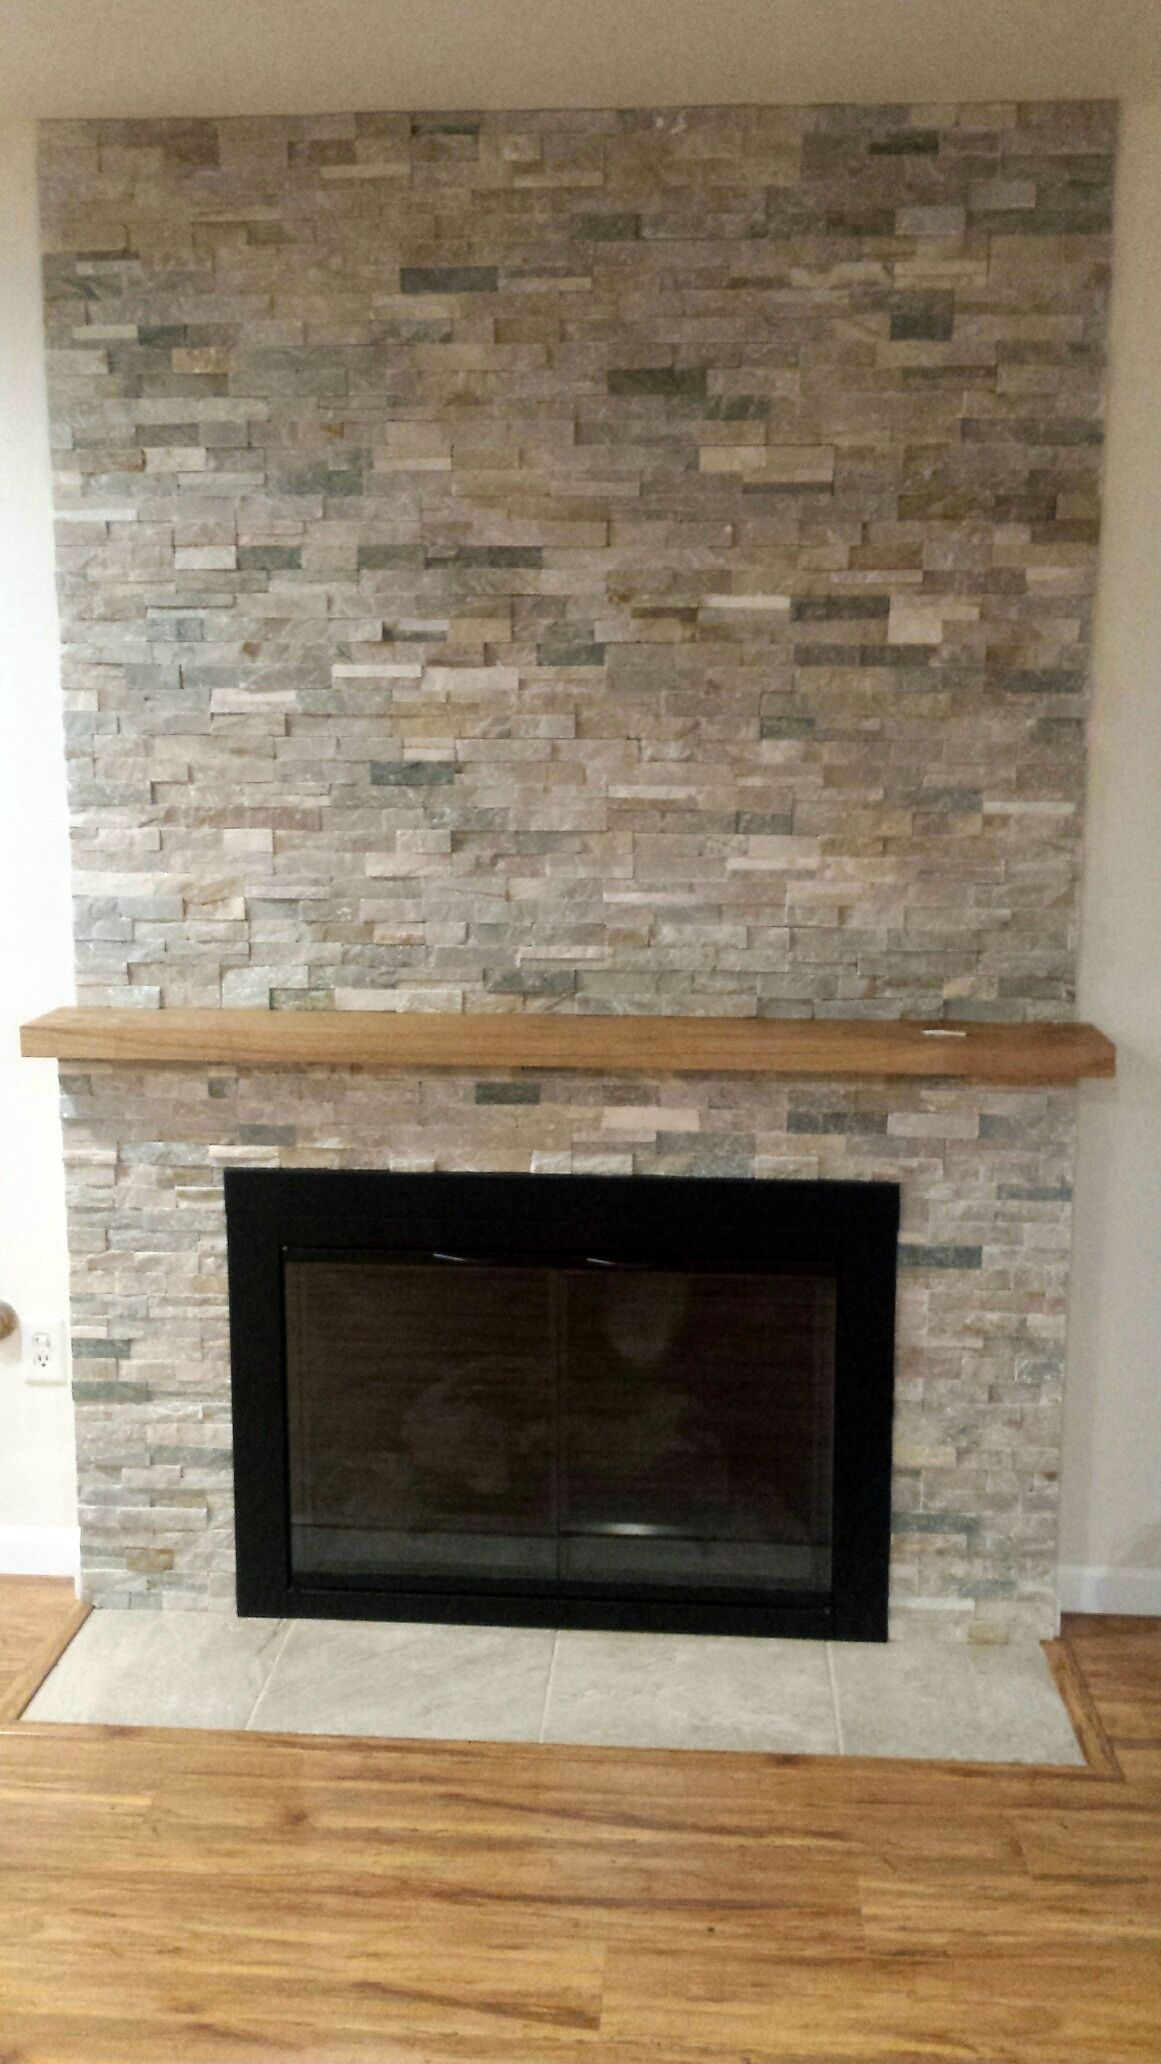 Stone Fireplace Desert Quartz Ledgestone Quartz Wall Tile From